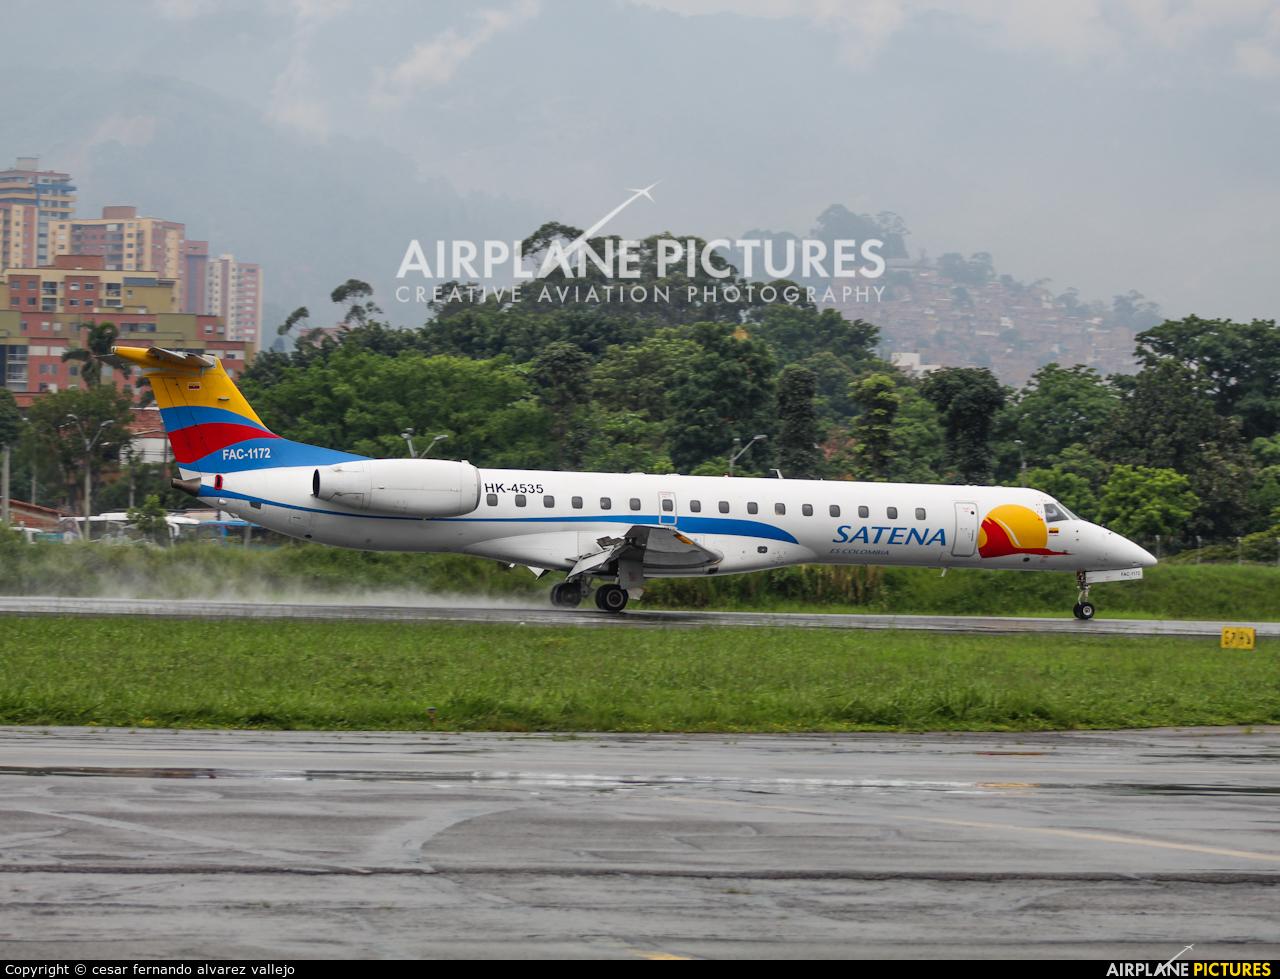 Satena HK-4535 aircraft at Medellin - Olaya Herrera